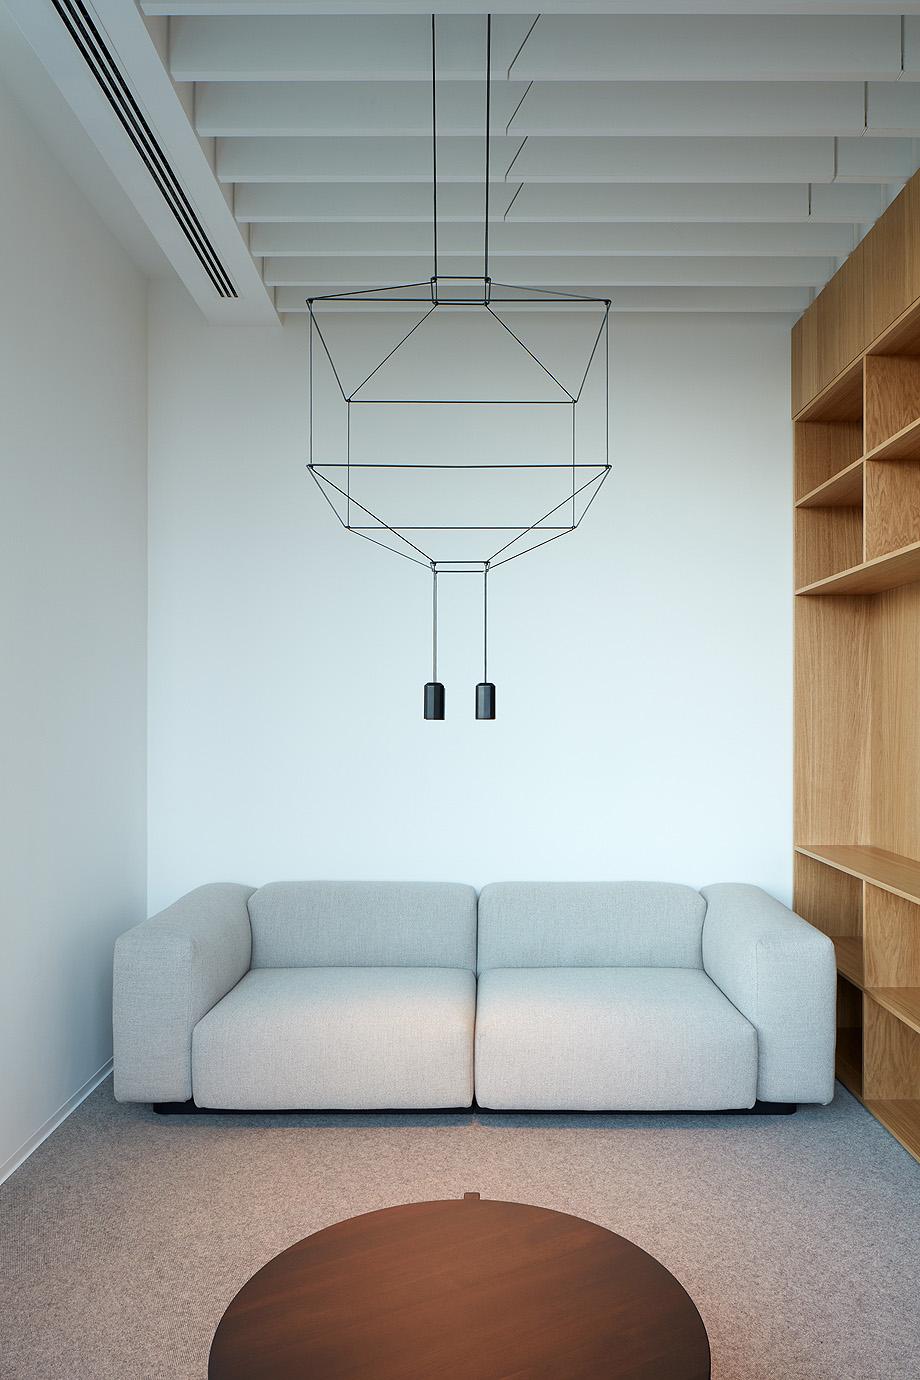 oficinas lucron de cechvala architects - foto boysplaynice (17)